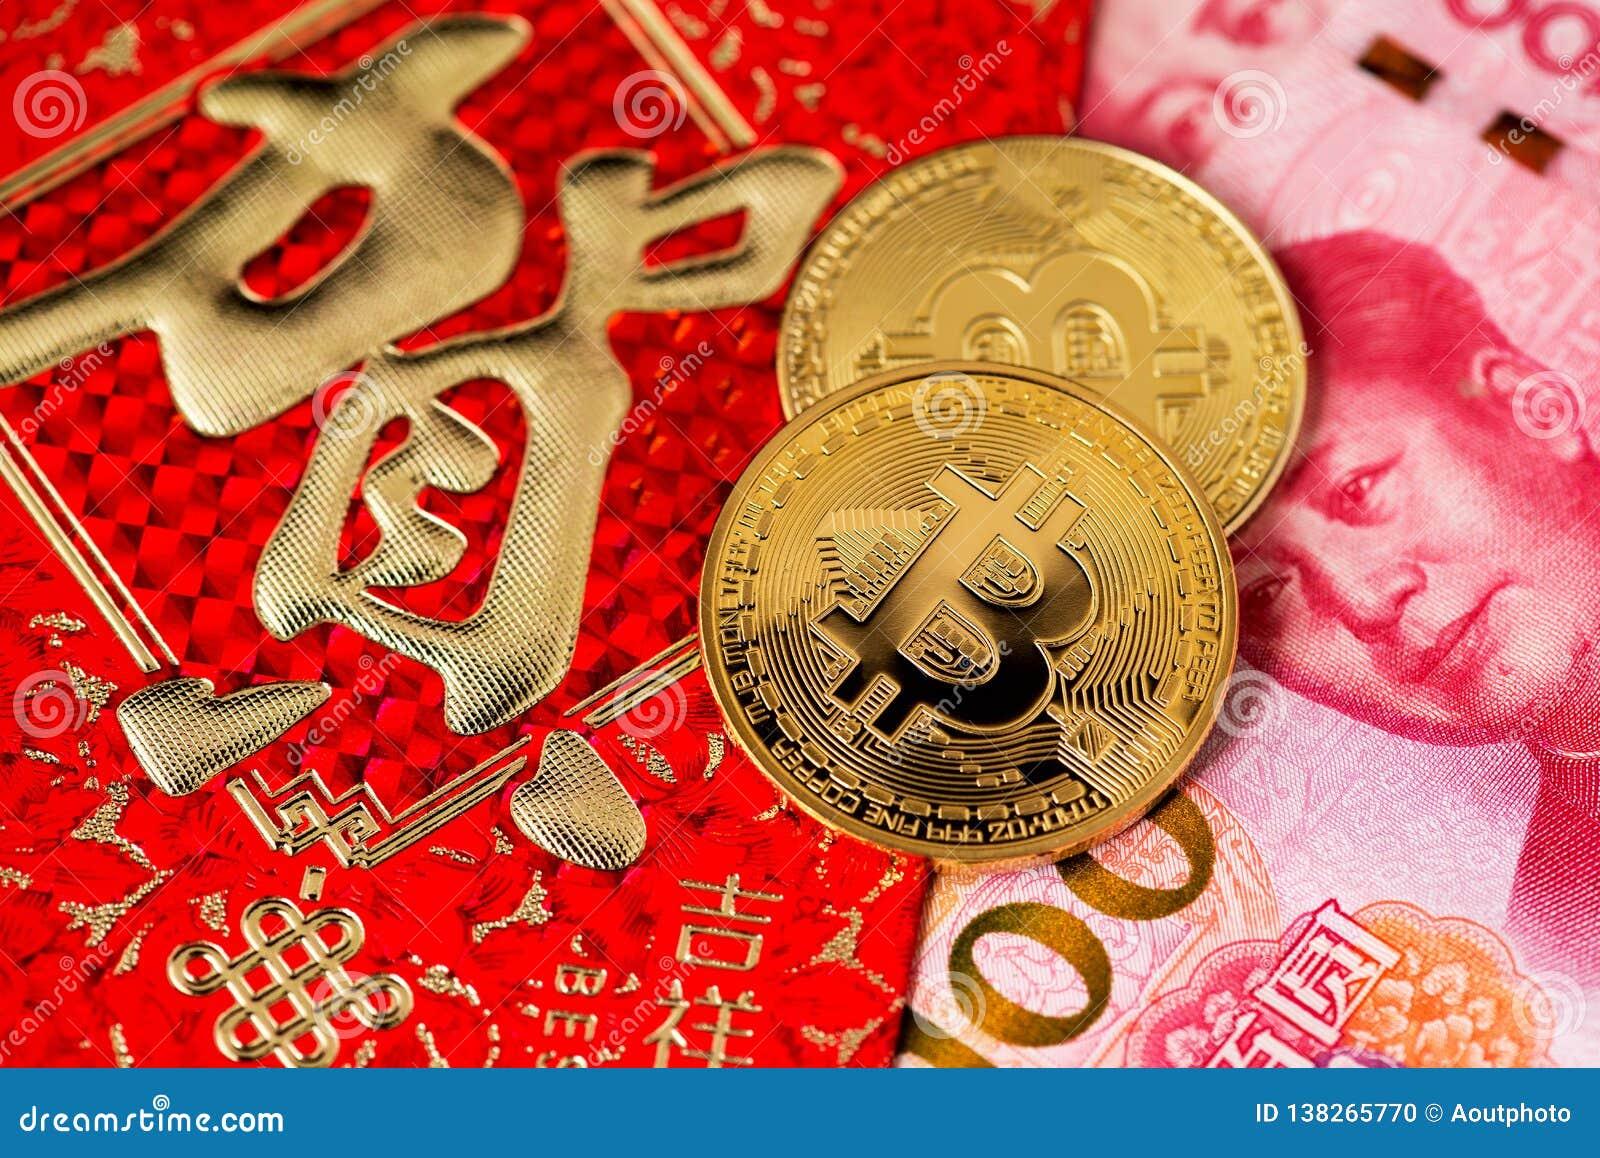 bitcoin trading platform recenzii